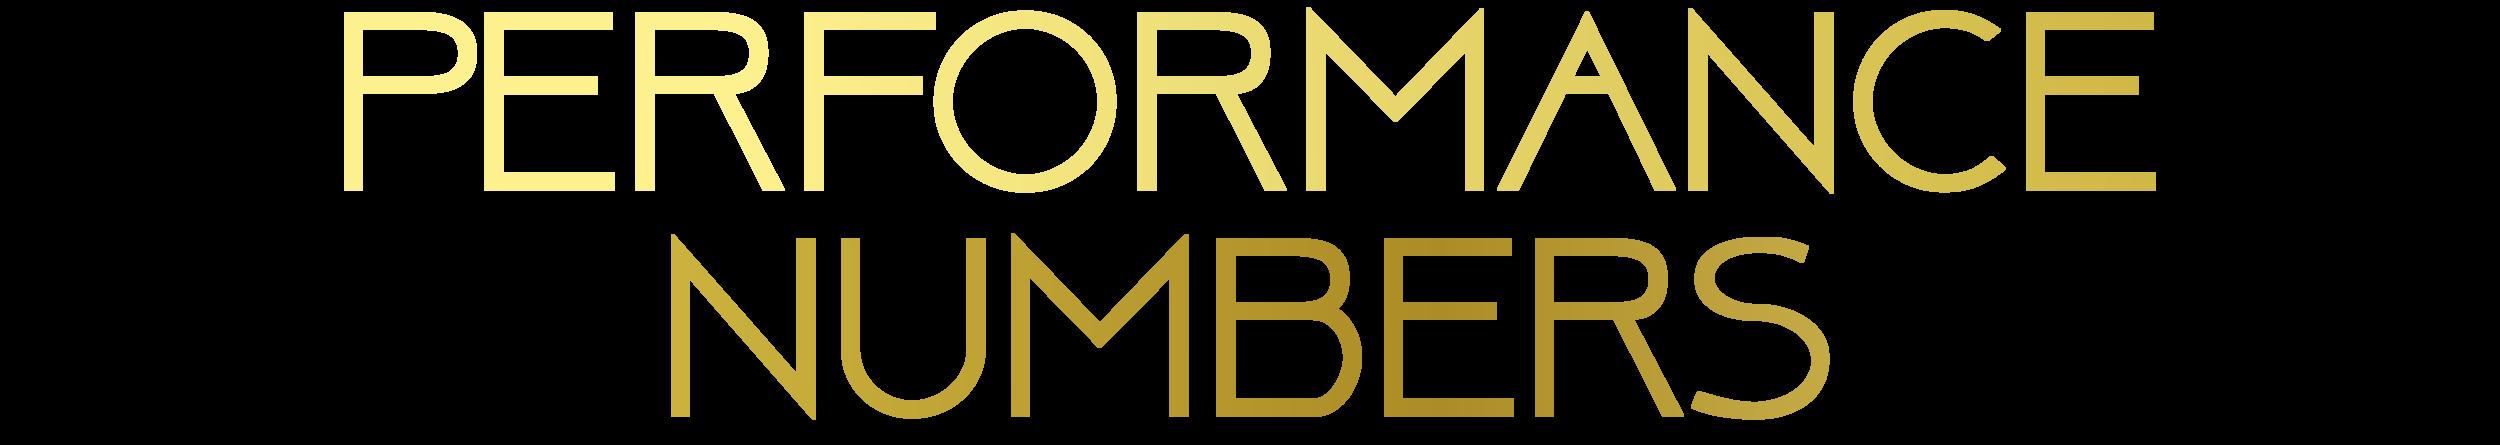 Perform Labels-02.png